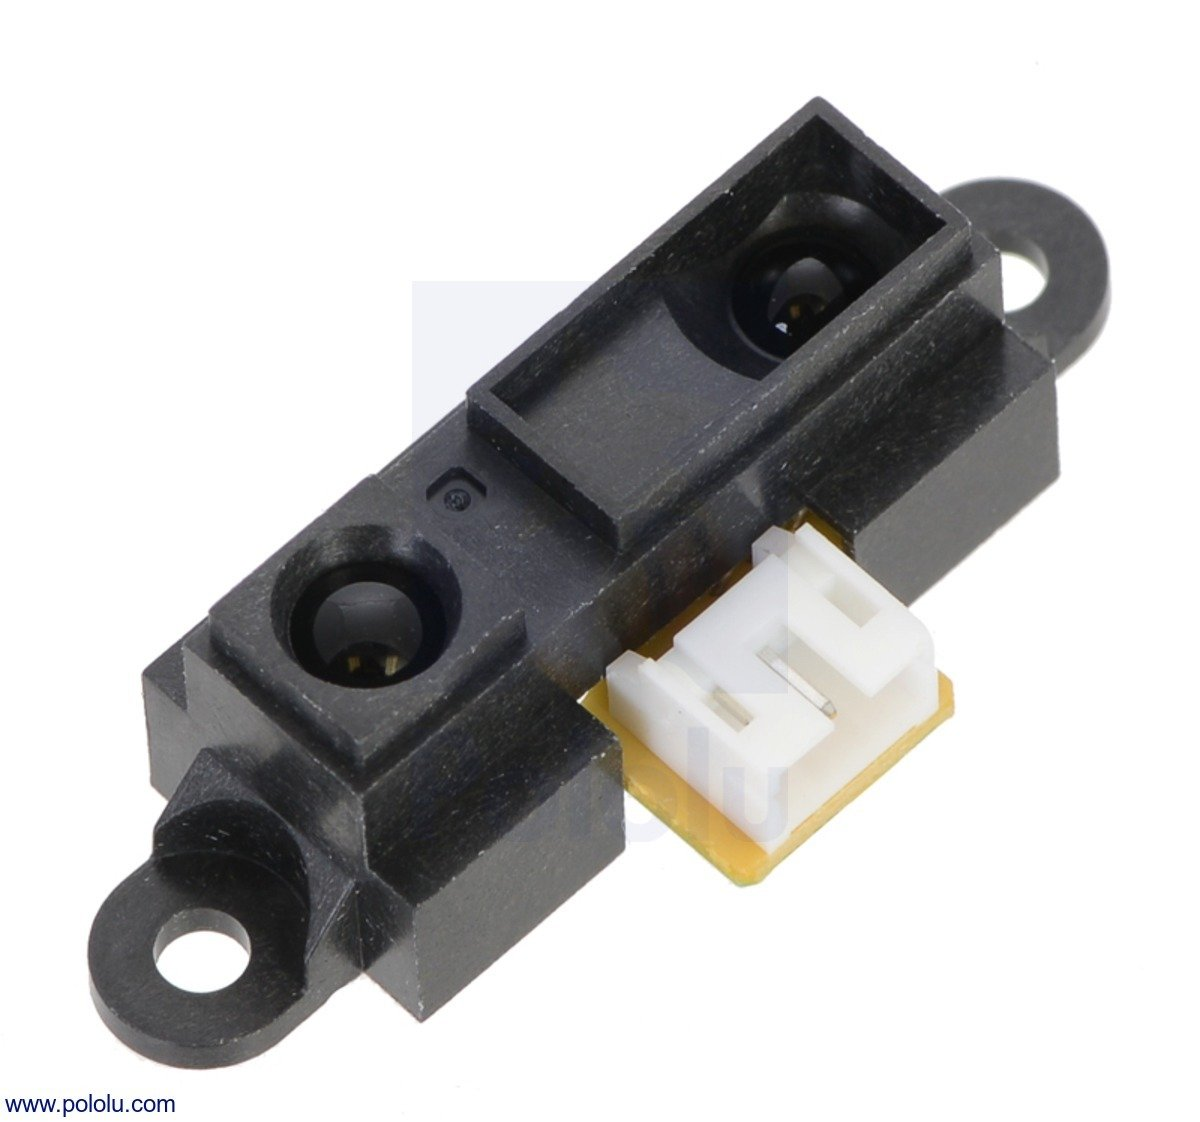 SHARP Distance Measuring Sensor unit 10 to 80 cm - GP2Y0A21YK0F